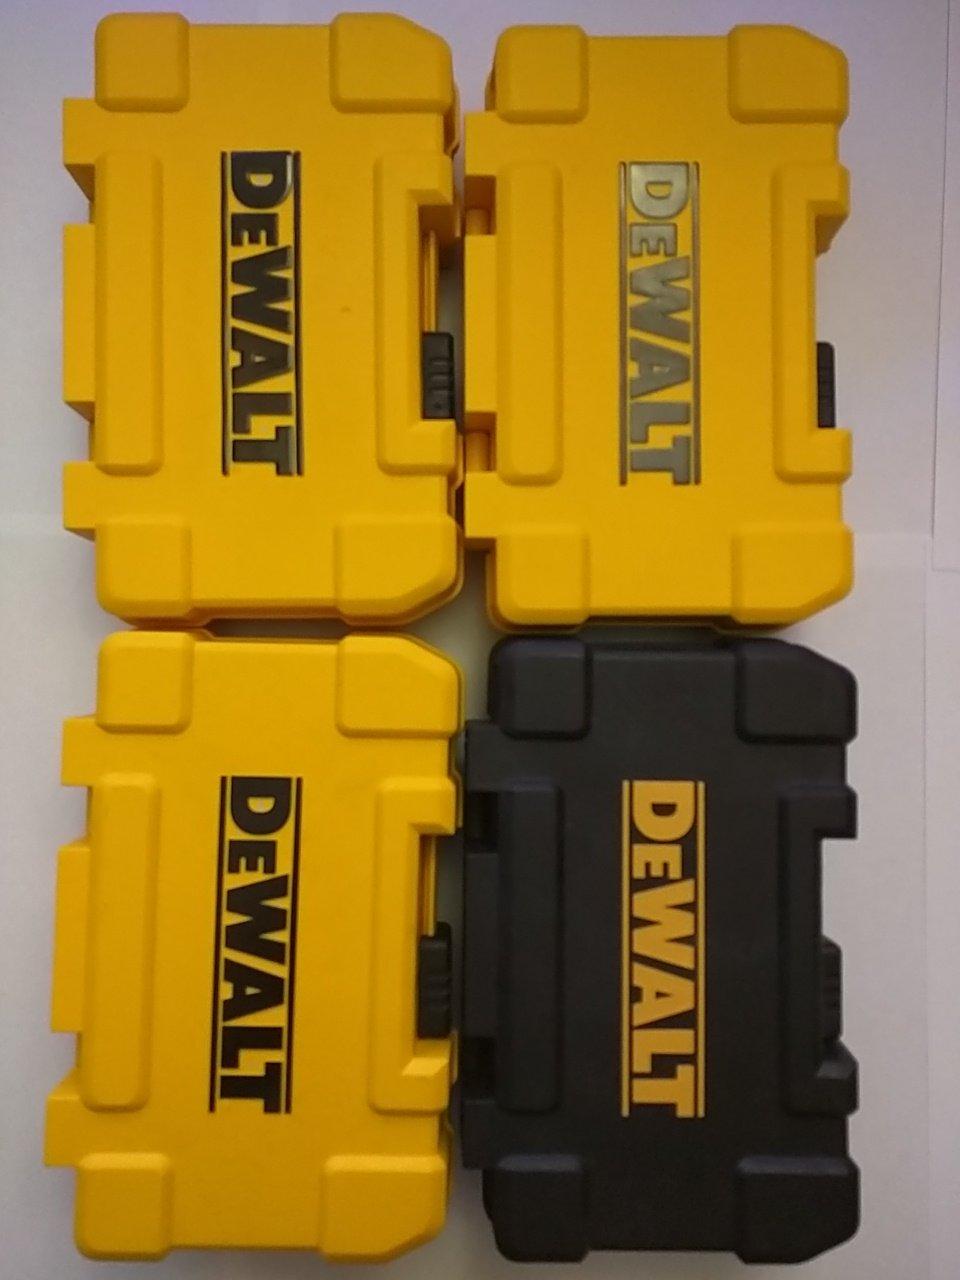 Dewalt 100-piece Impact Screw Driving Bit Set DWA4CASE2